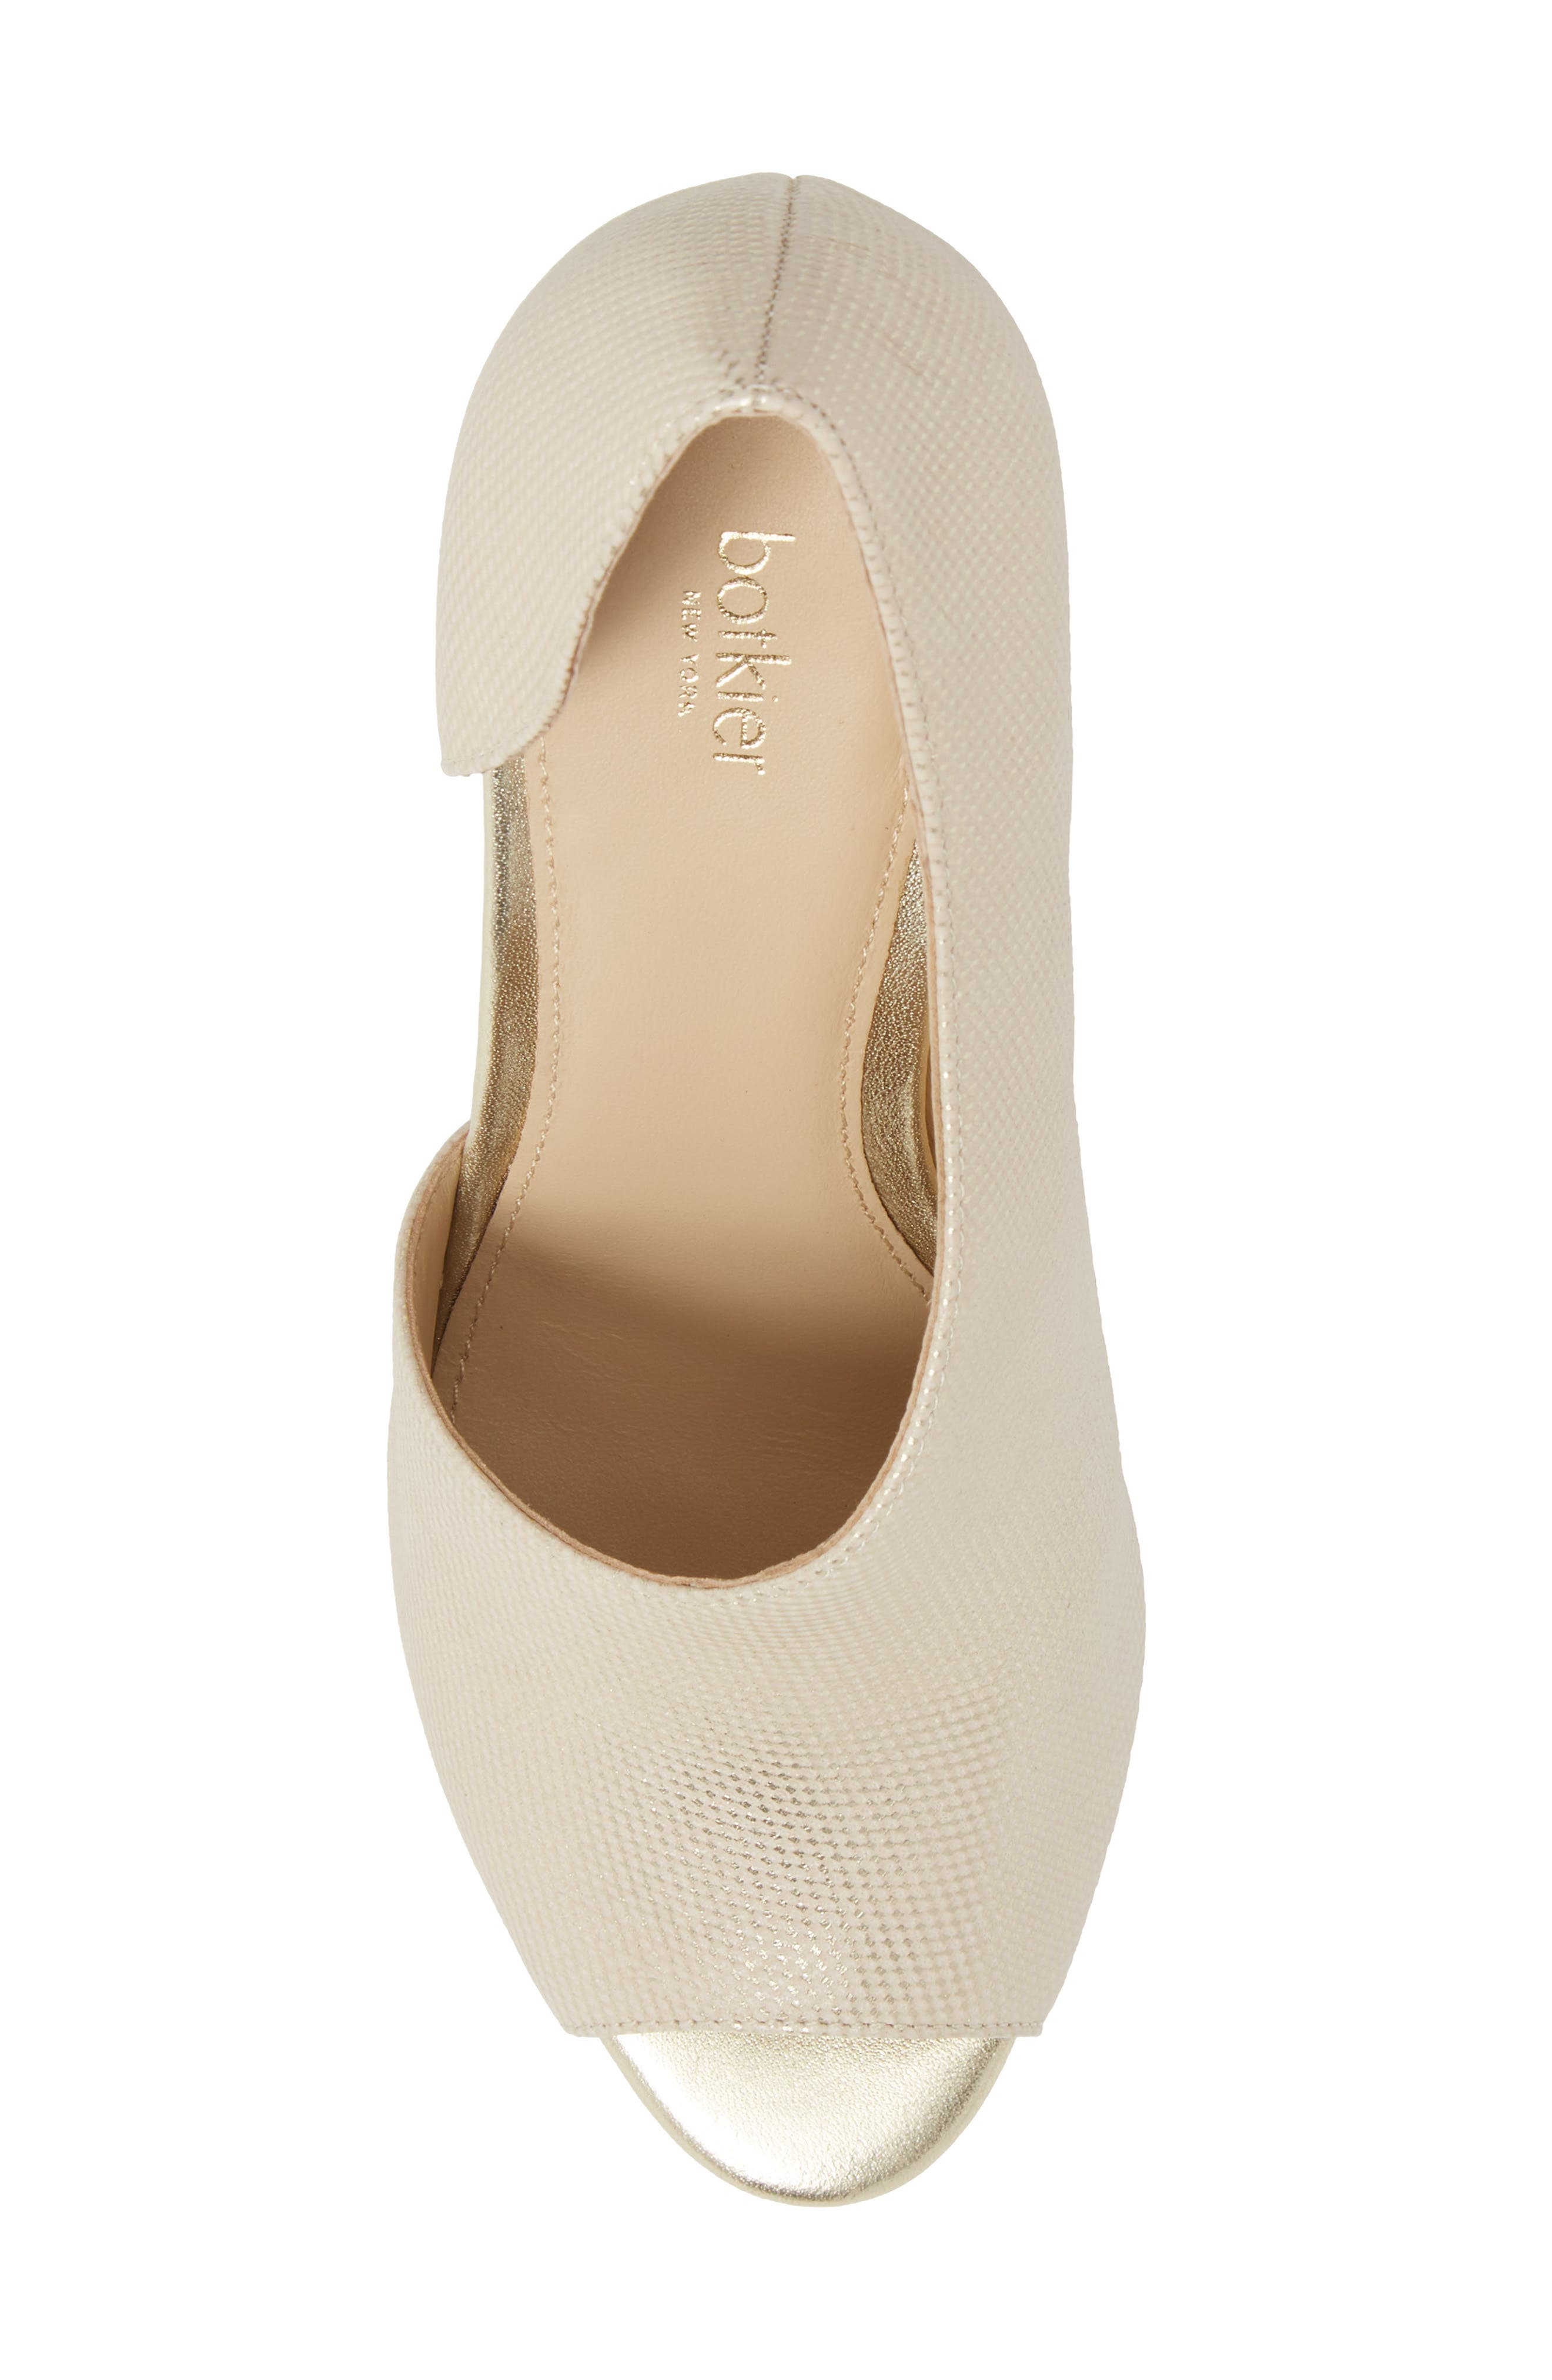 Adelia Asymmetrical Sandal,                             Alternate thumbnail 5, color,                             Gold Shimmer Fabric